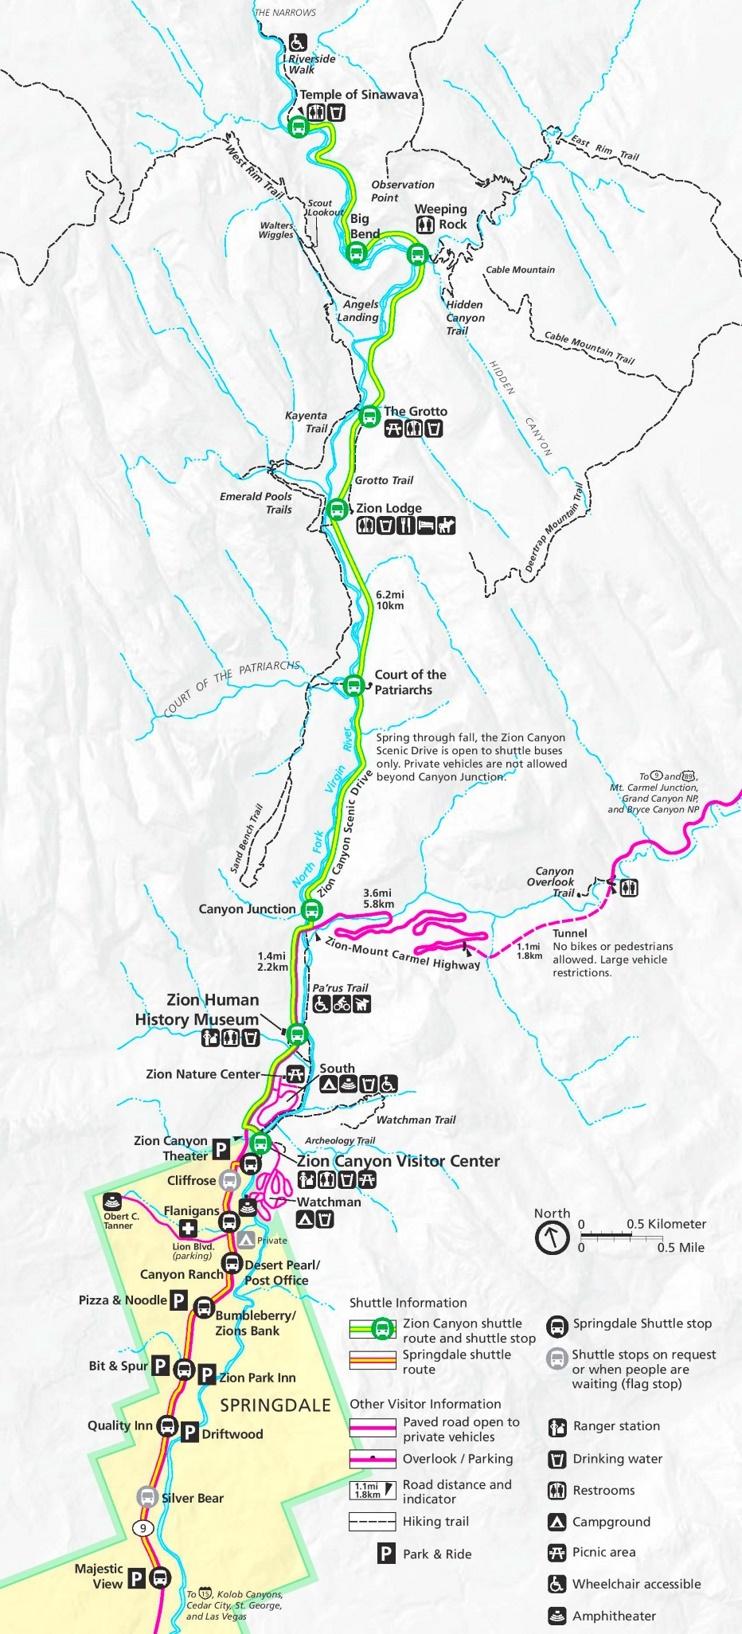 Zion Canyon map